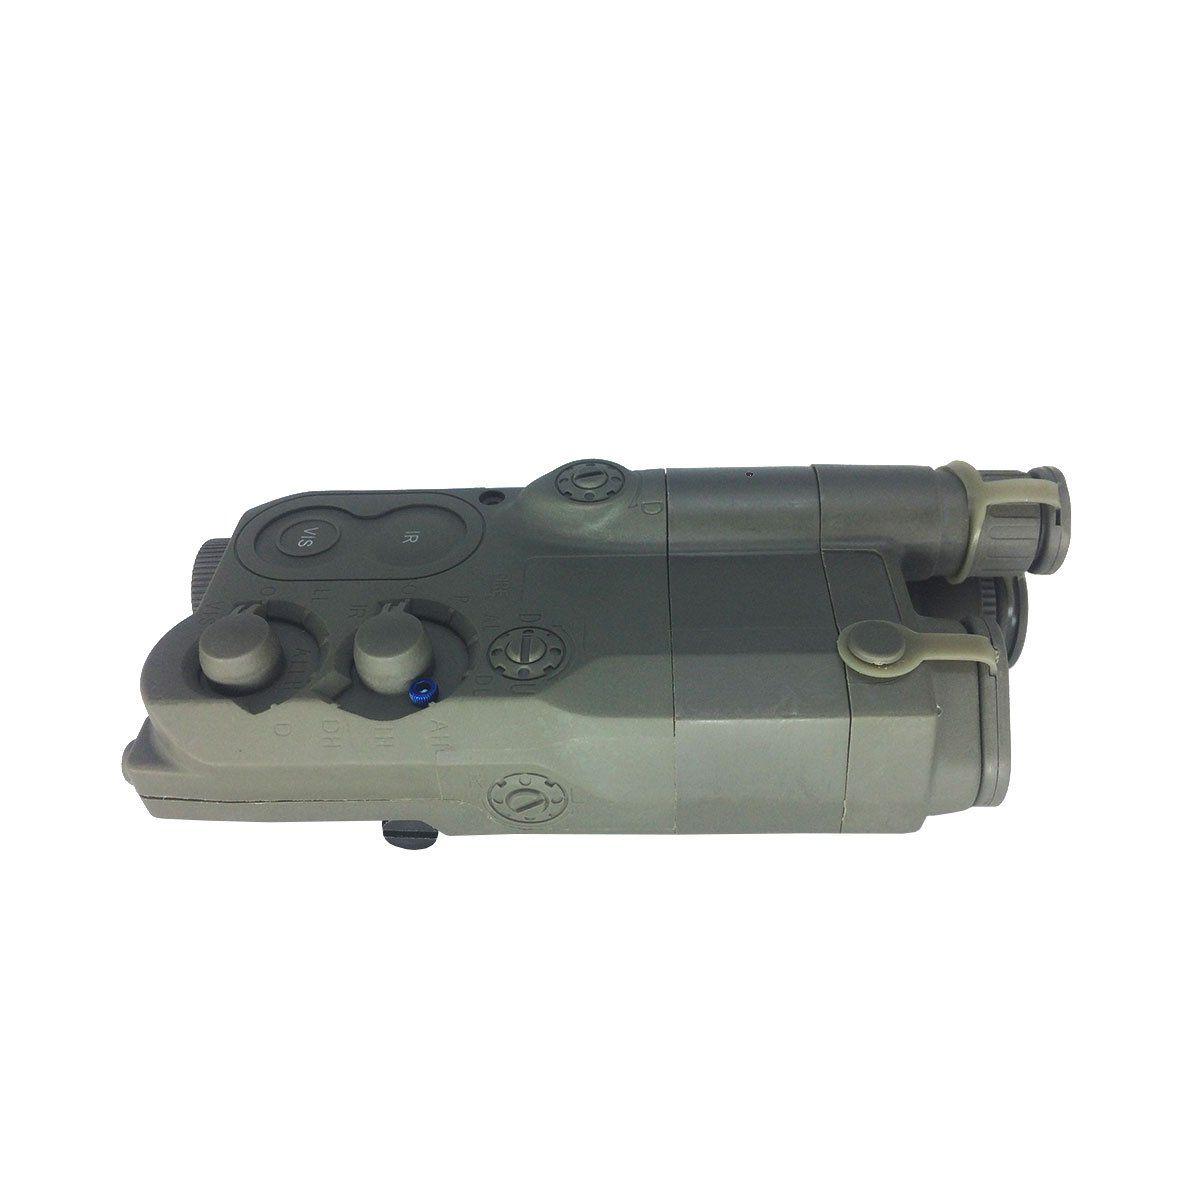 Caixa Para Bateria FMA AN/PEQ-16 FG Coyote